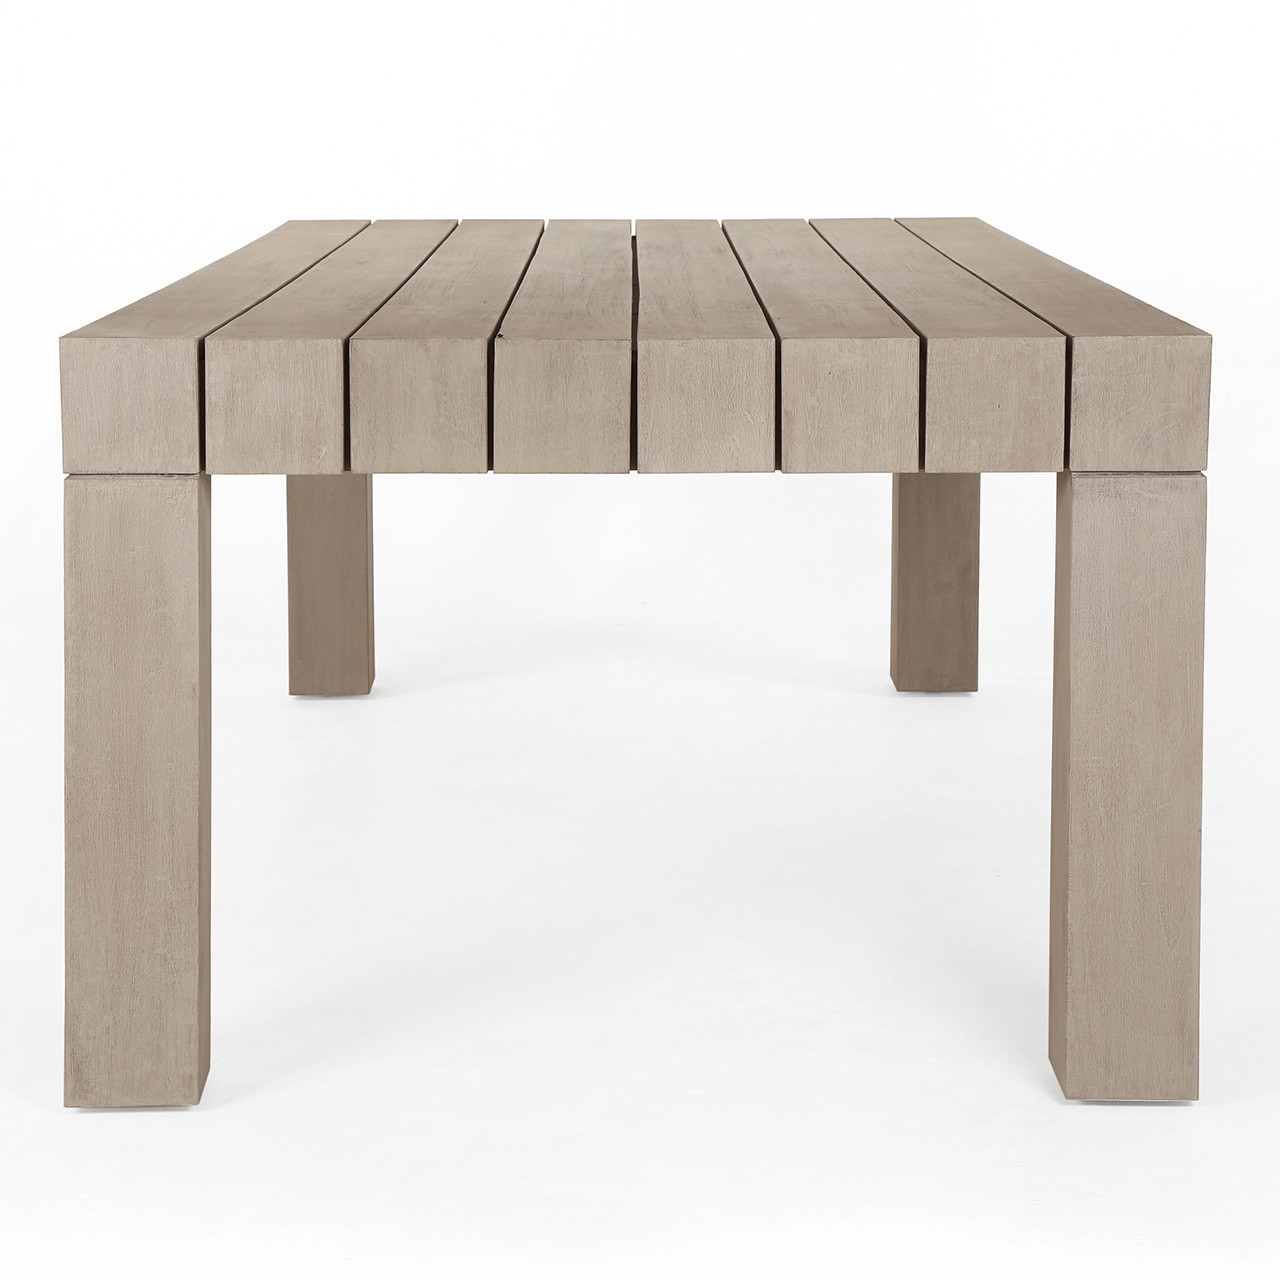 Del Mar Teak Outdoor Dining Table